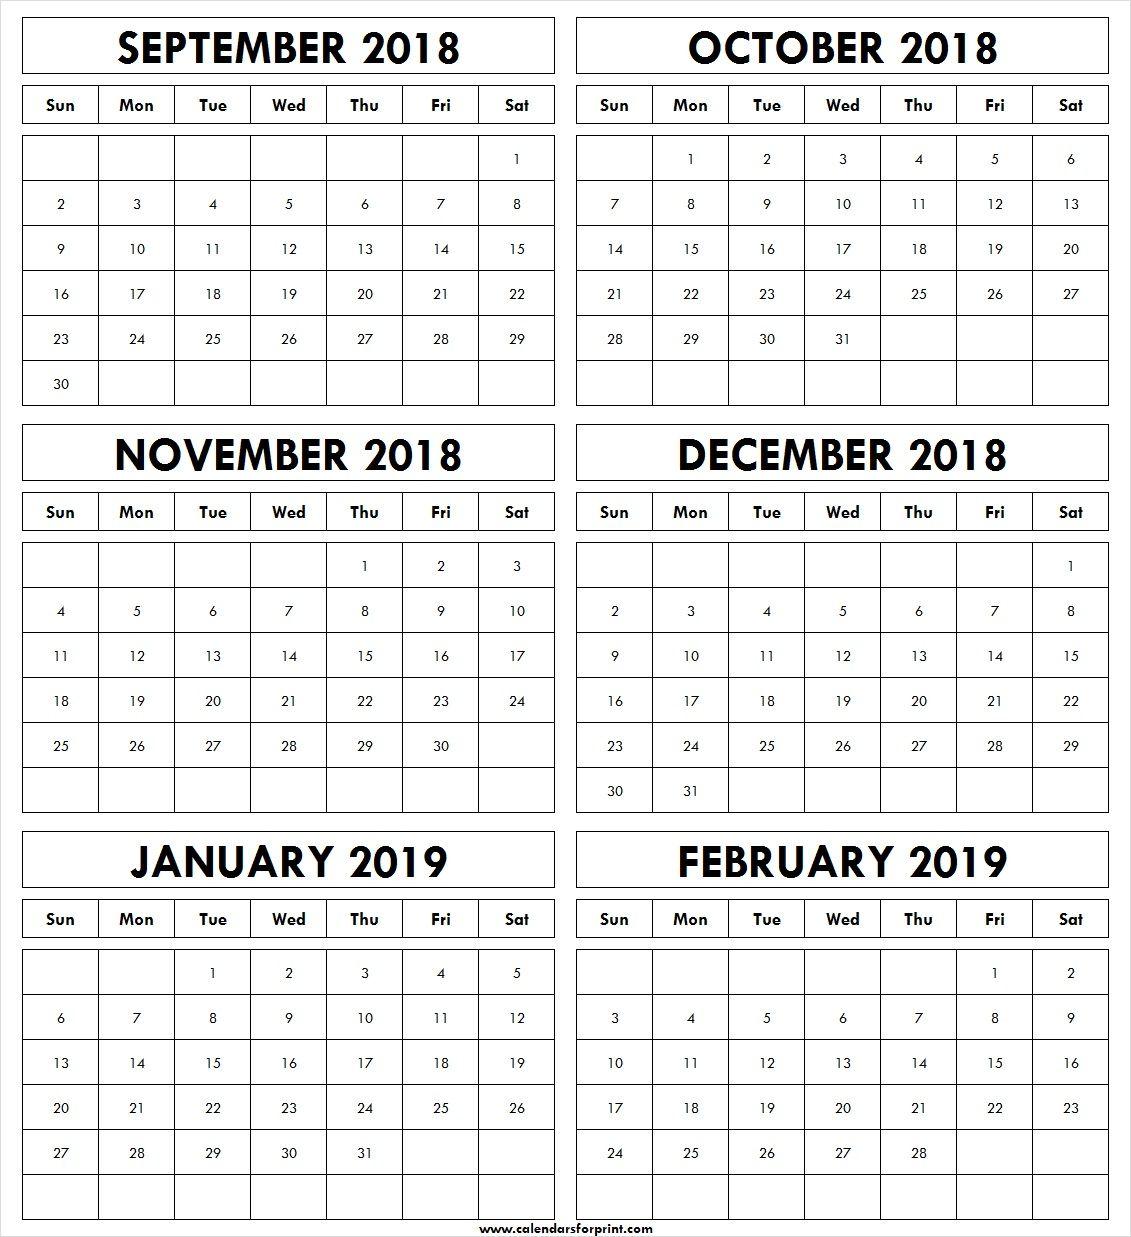 Free Printable 2019 Four Months Blank September,October,Novevember, December Calendar With Holidays September October November December 2018 January February 2019